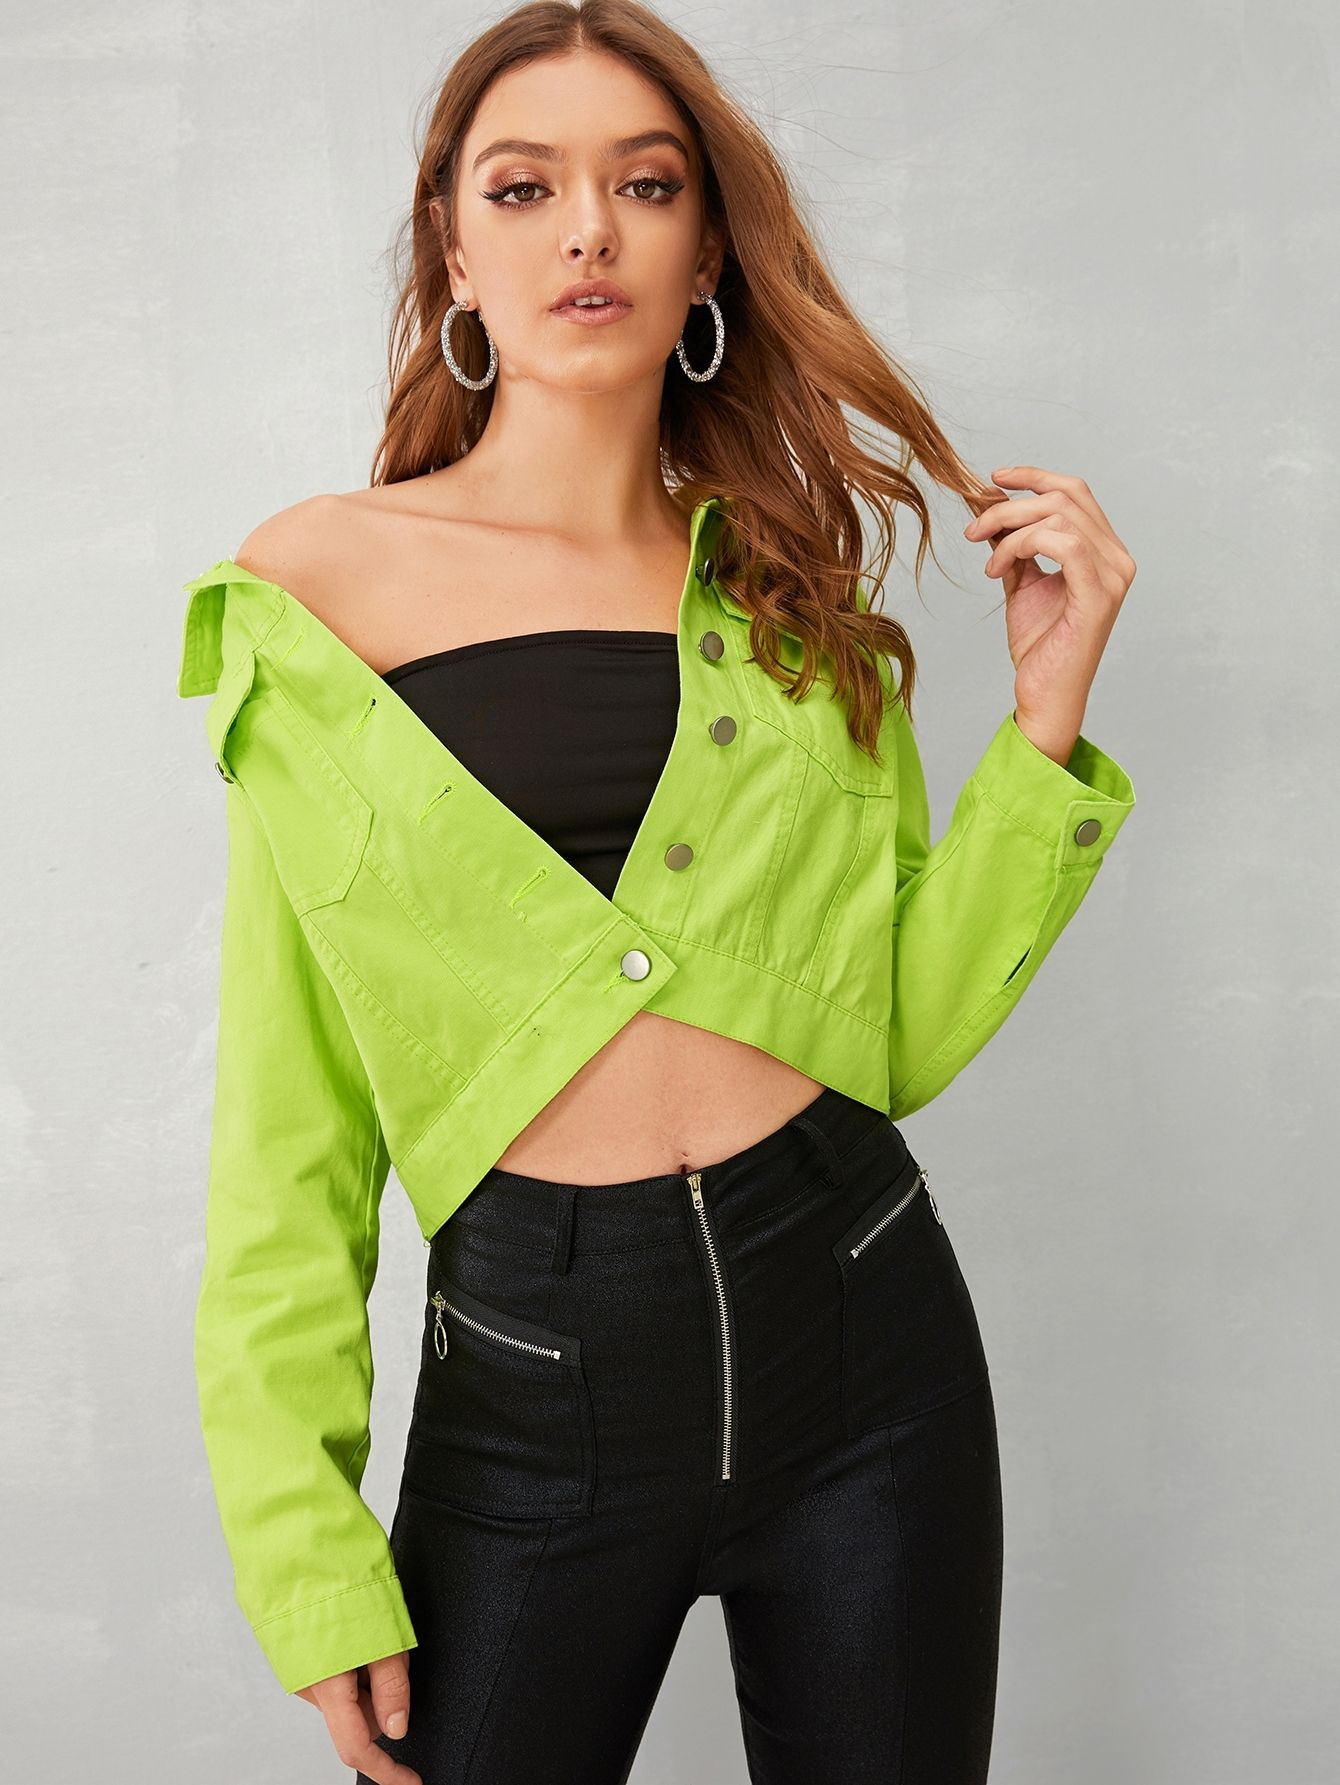 Ad Neon Green Button Through Denim Jacket Tags Casual Green Bright Plain Collar Crop Ot Green Denim Jacket Neon Green Outfits Green Denim Jacket Women [ 1785 x 1340 Pixel ]